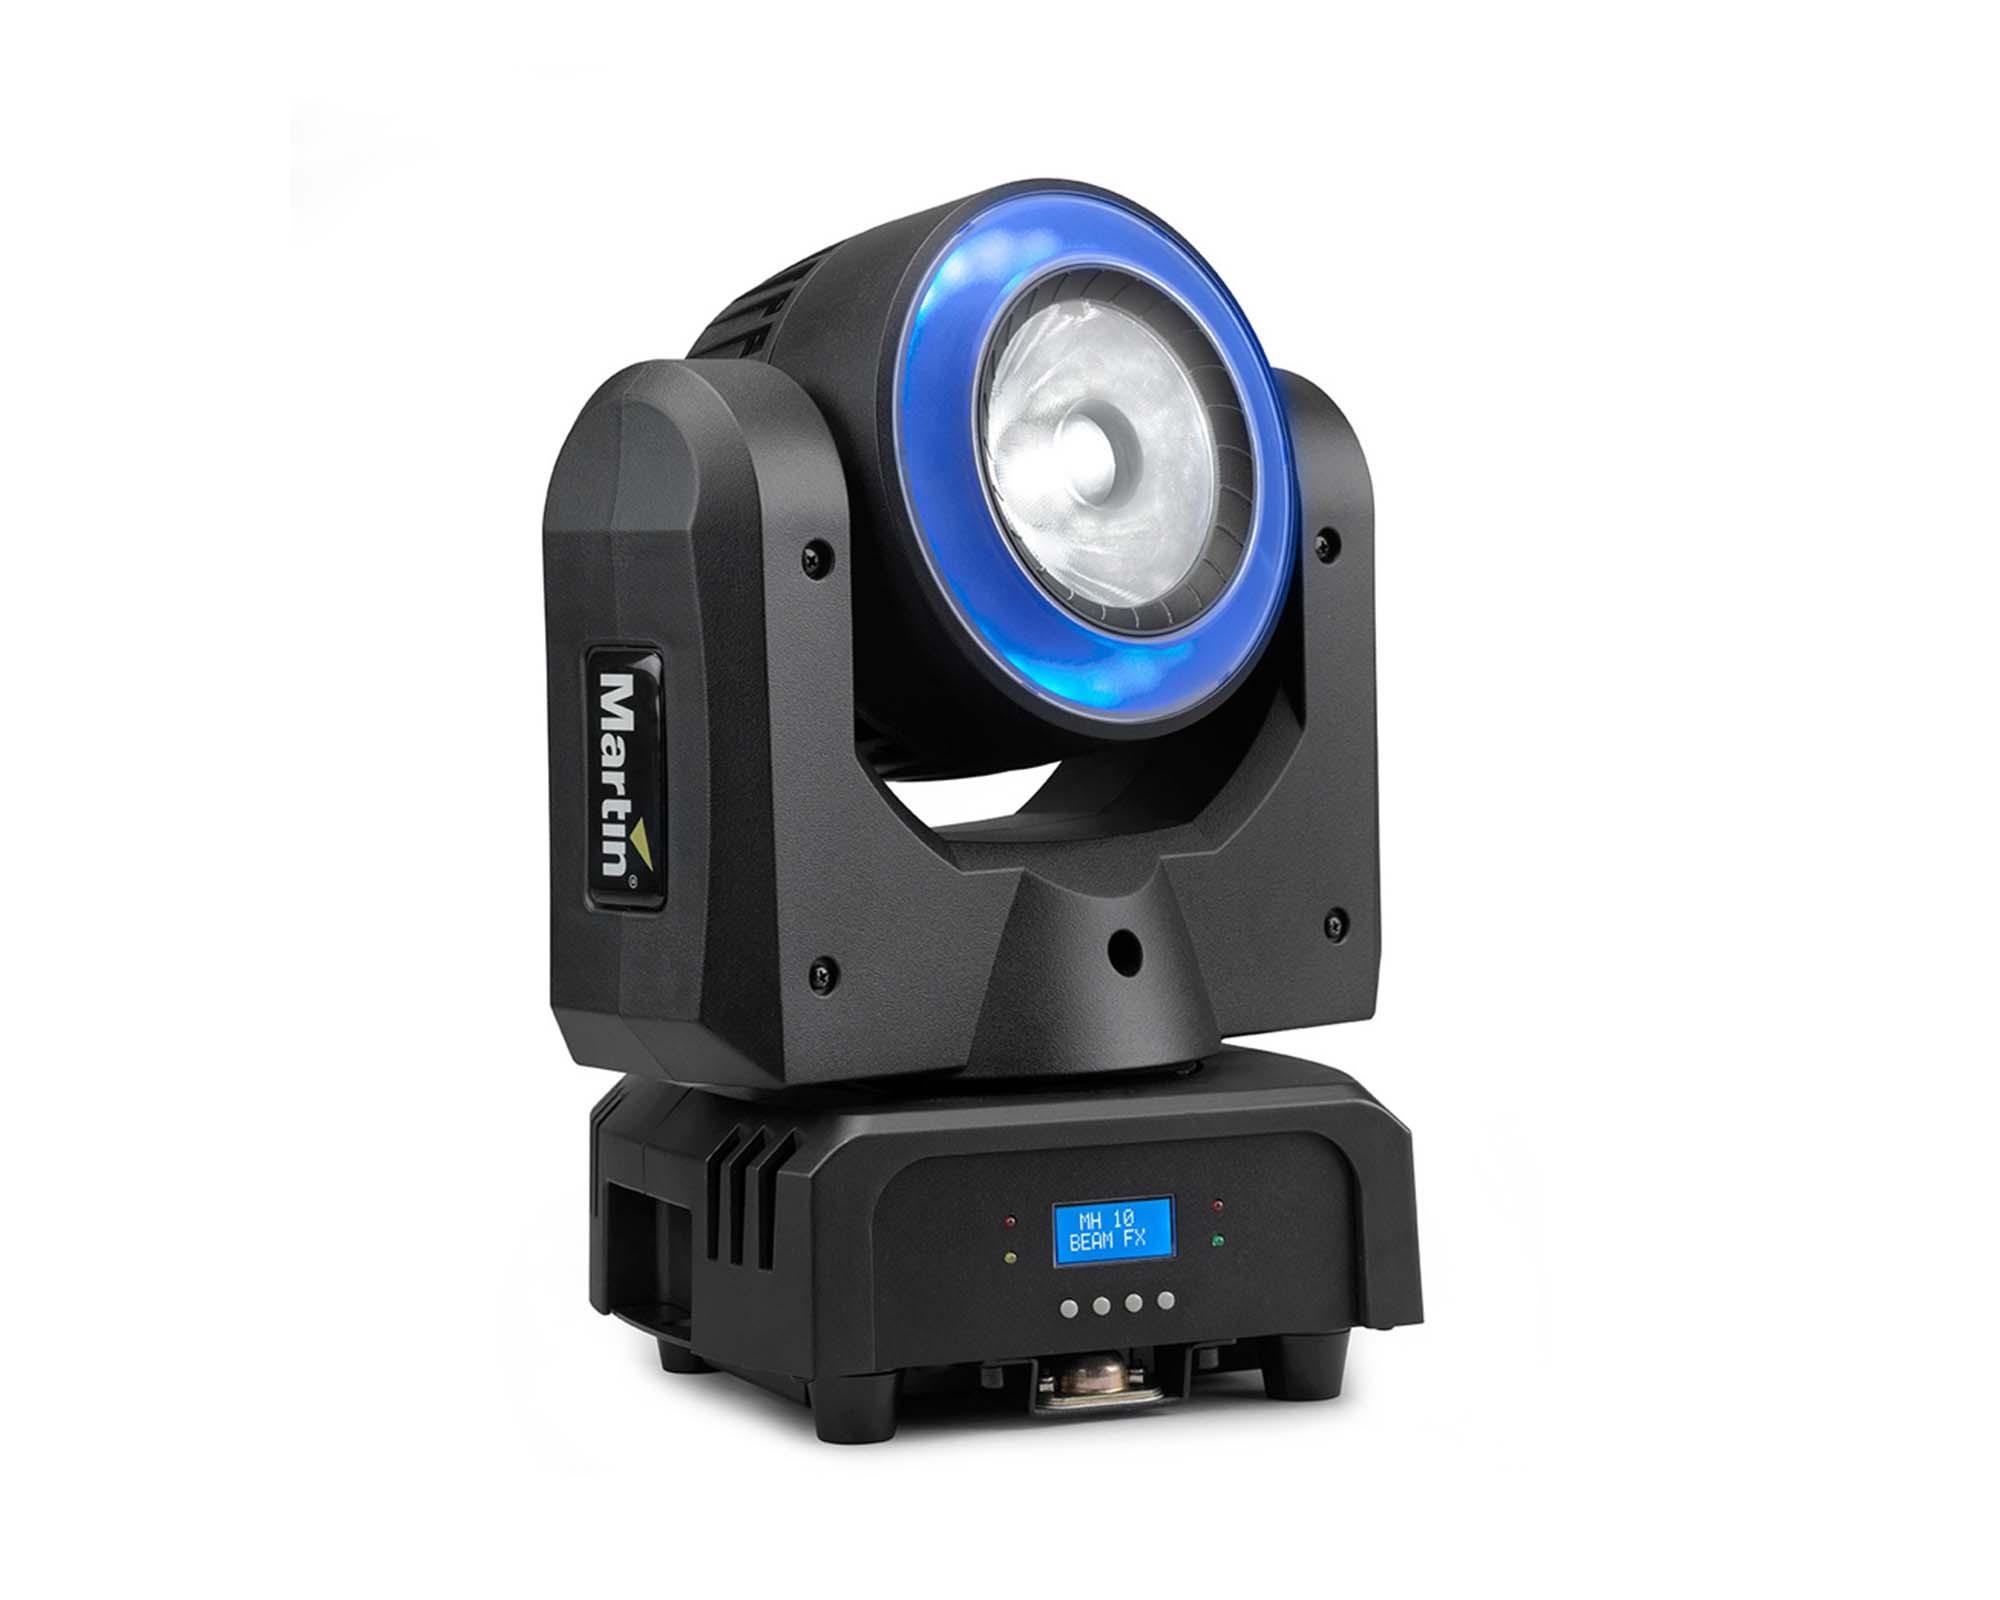 Buy RUSH MH10 Beam FX Compact 60W RGBW LED Beam - 90280120